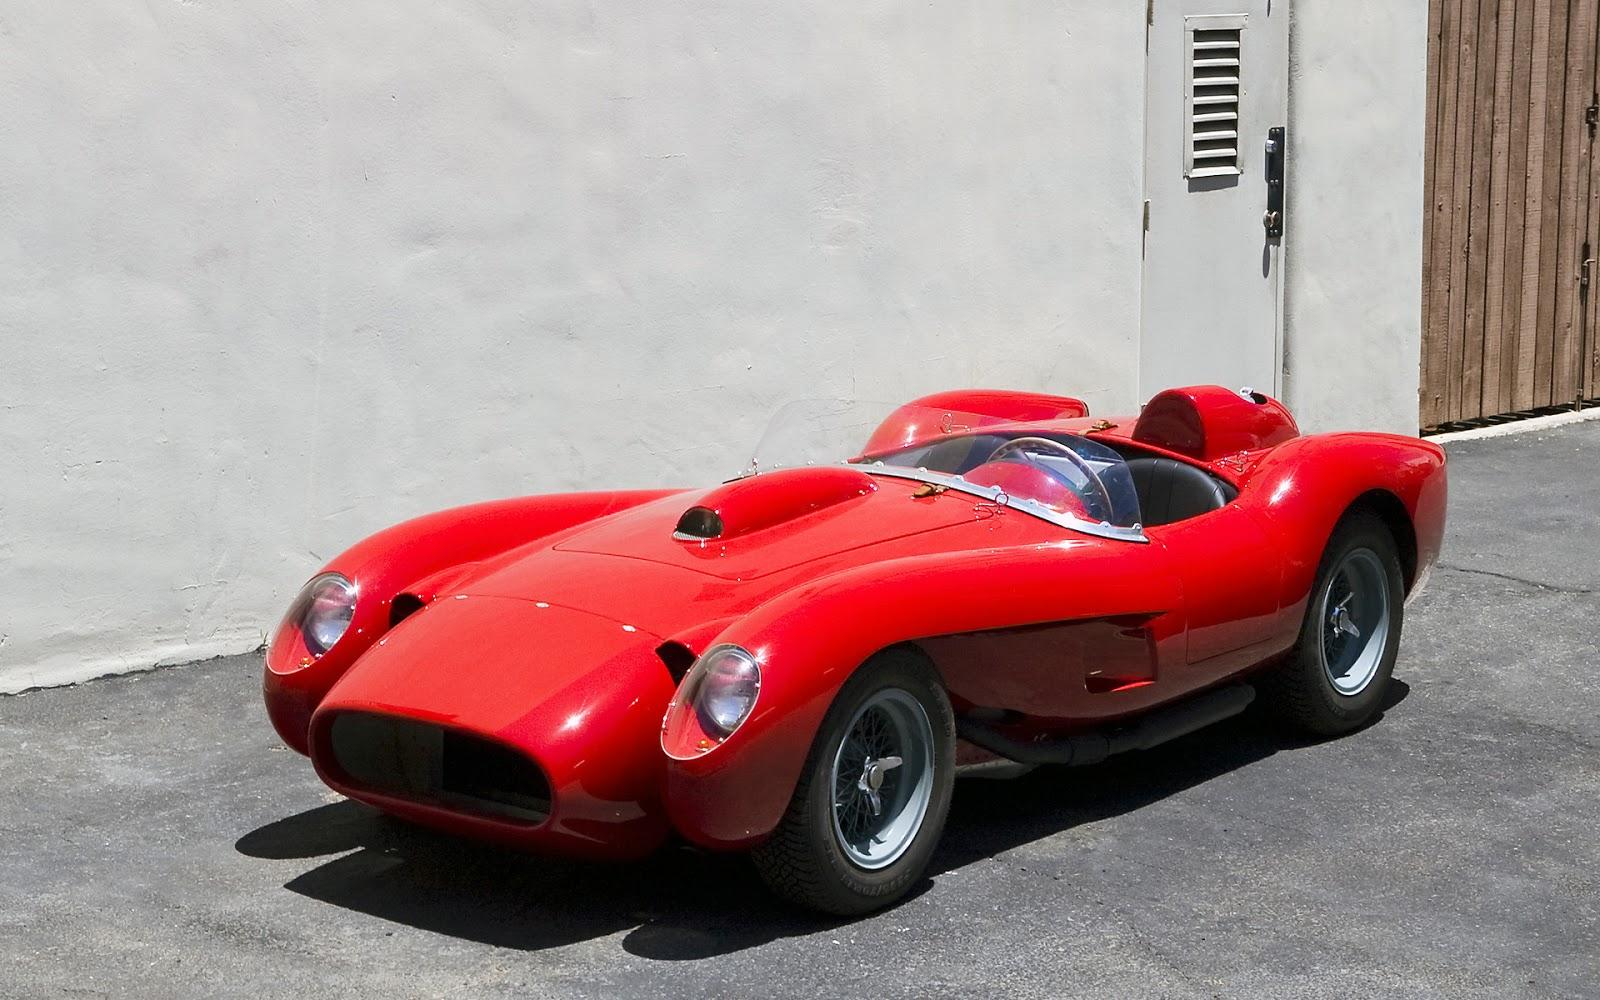 Ferrari 250 testa rossa super cars ferrari 250 testa rossa vanachro Image collections